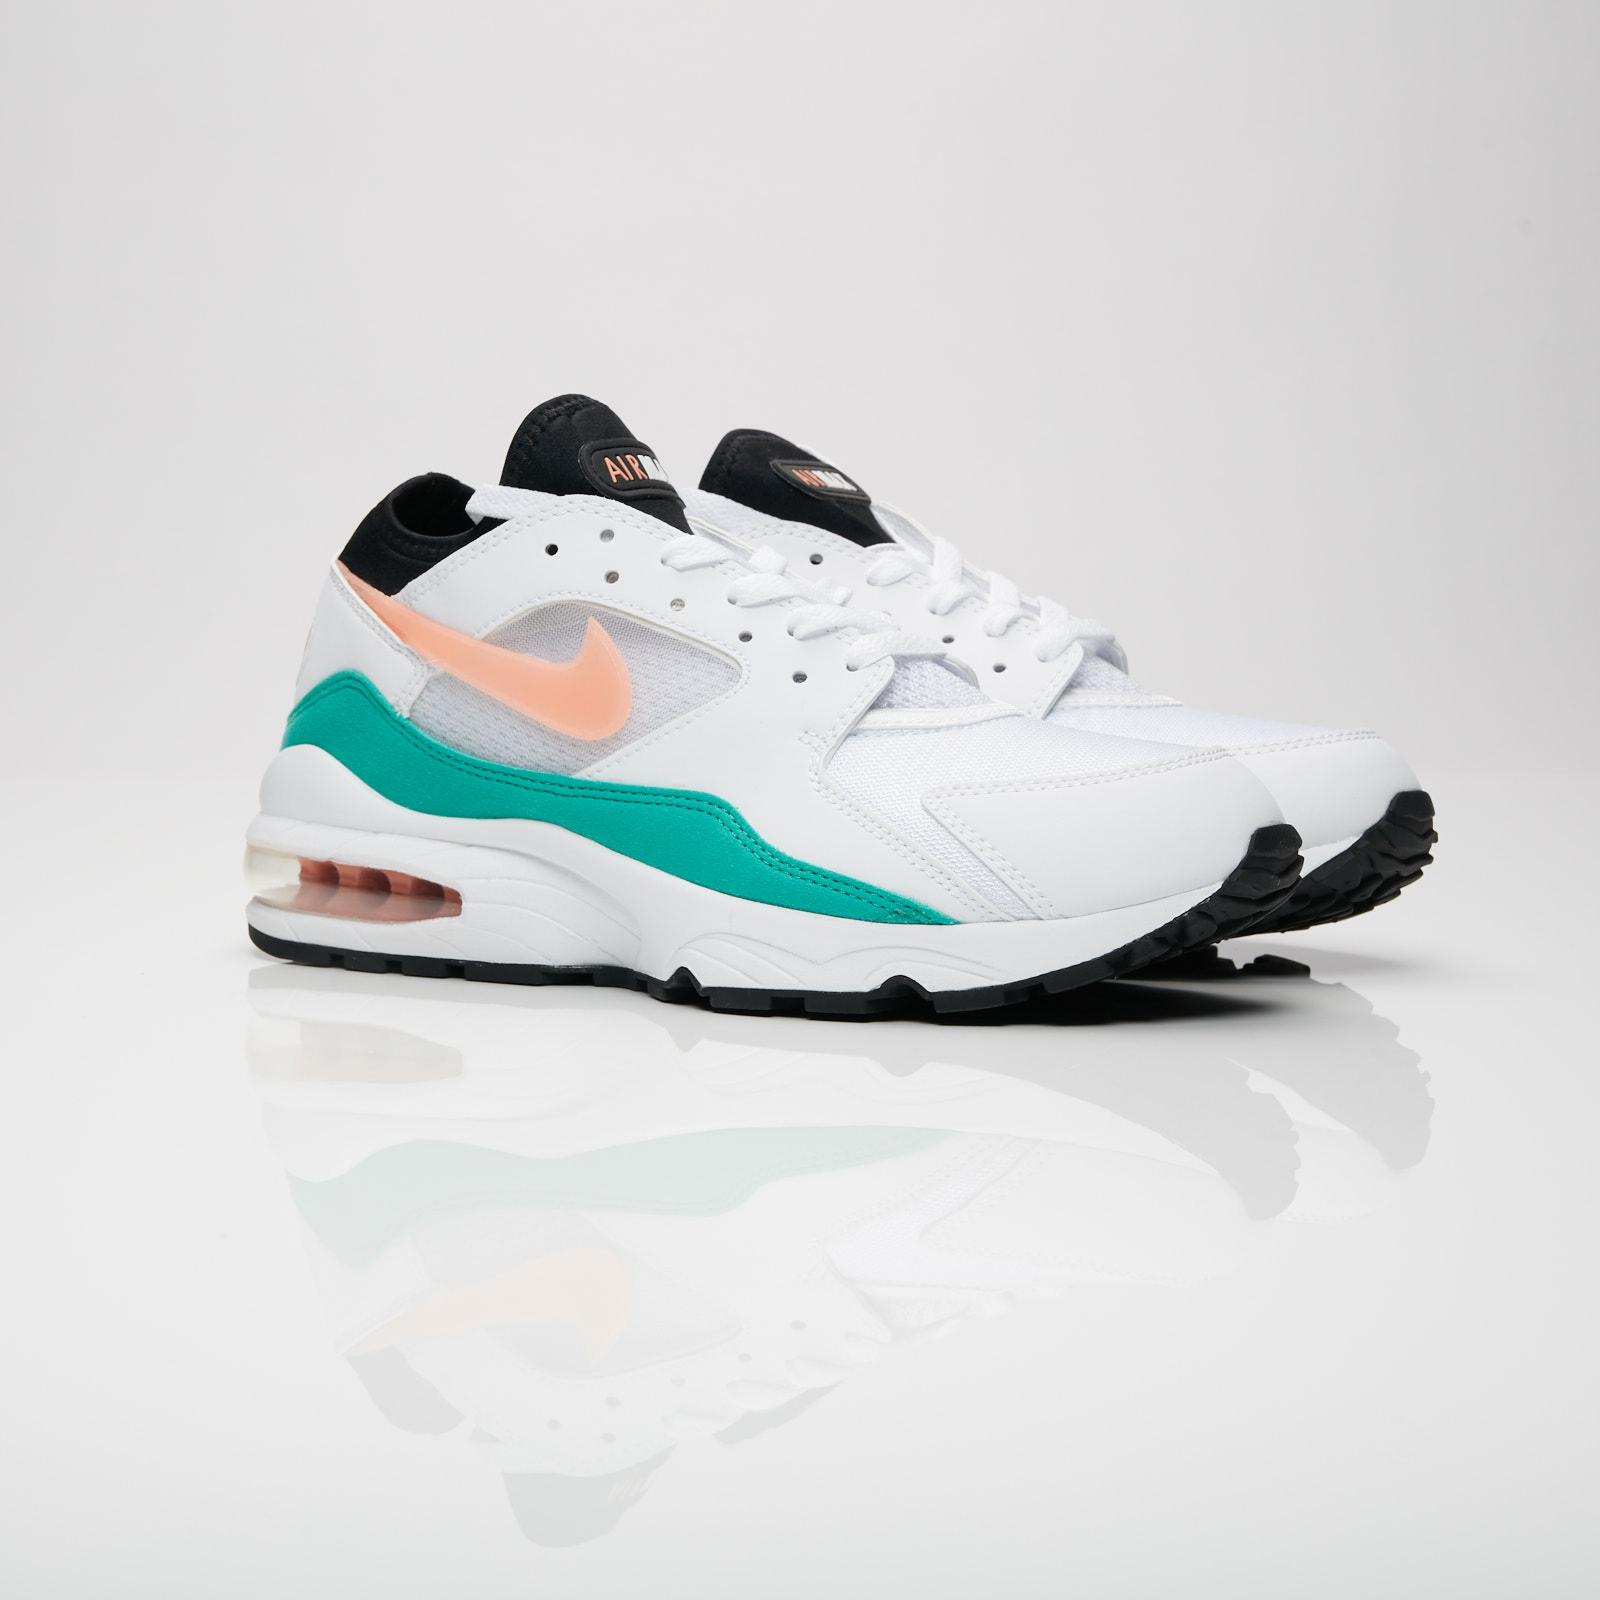 reputable site 60aa3 cadb5 Nike Sportswear Air Max 93